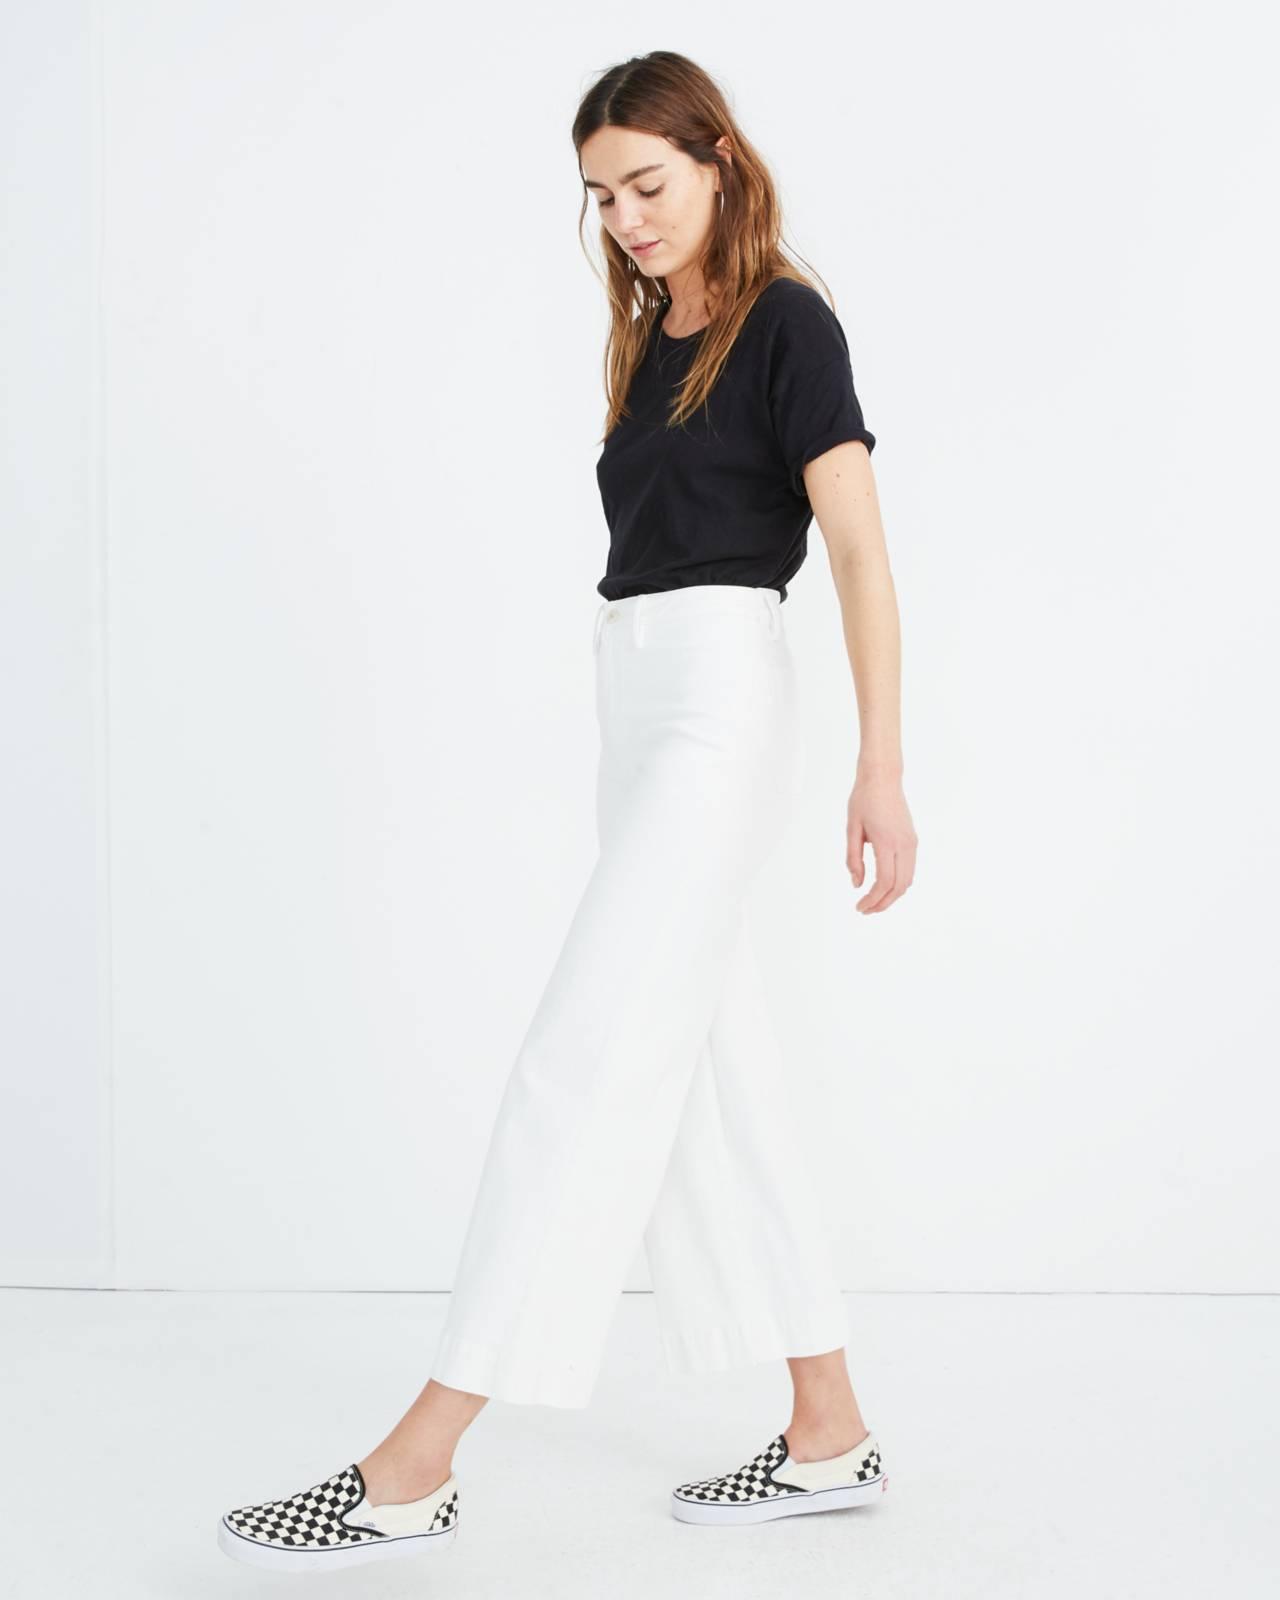 Tall Emmett Wide-Leg Crop Jeans in Tile White in tile white image 2